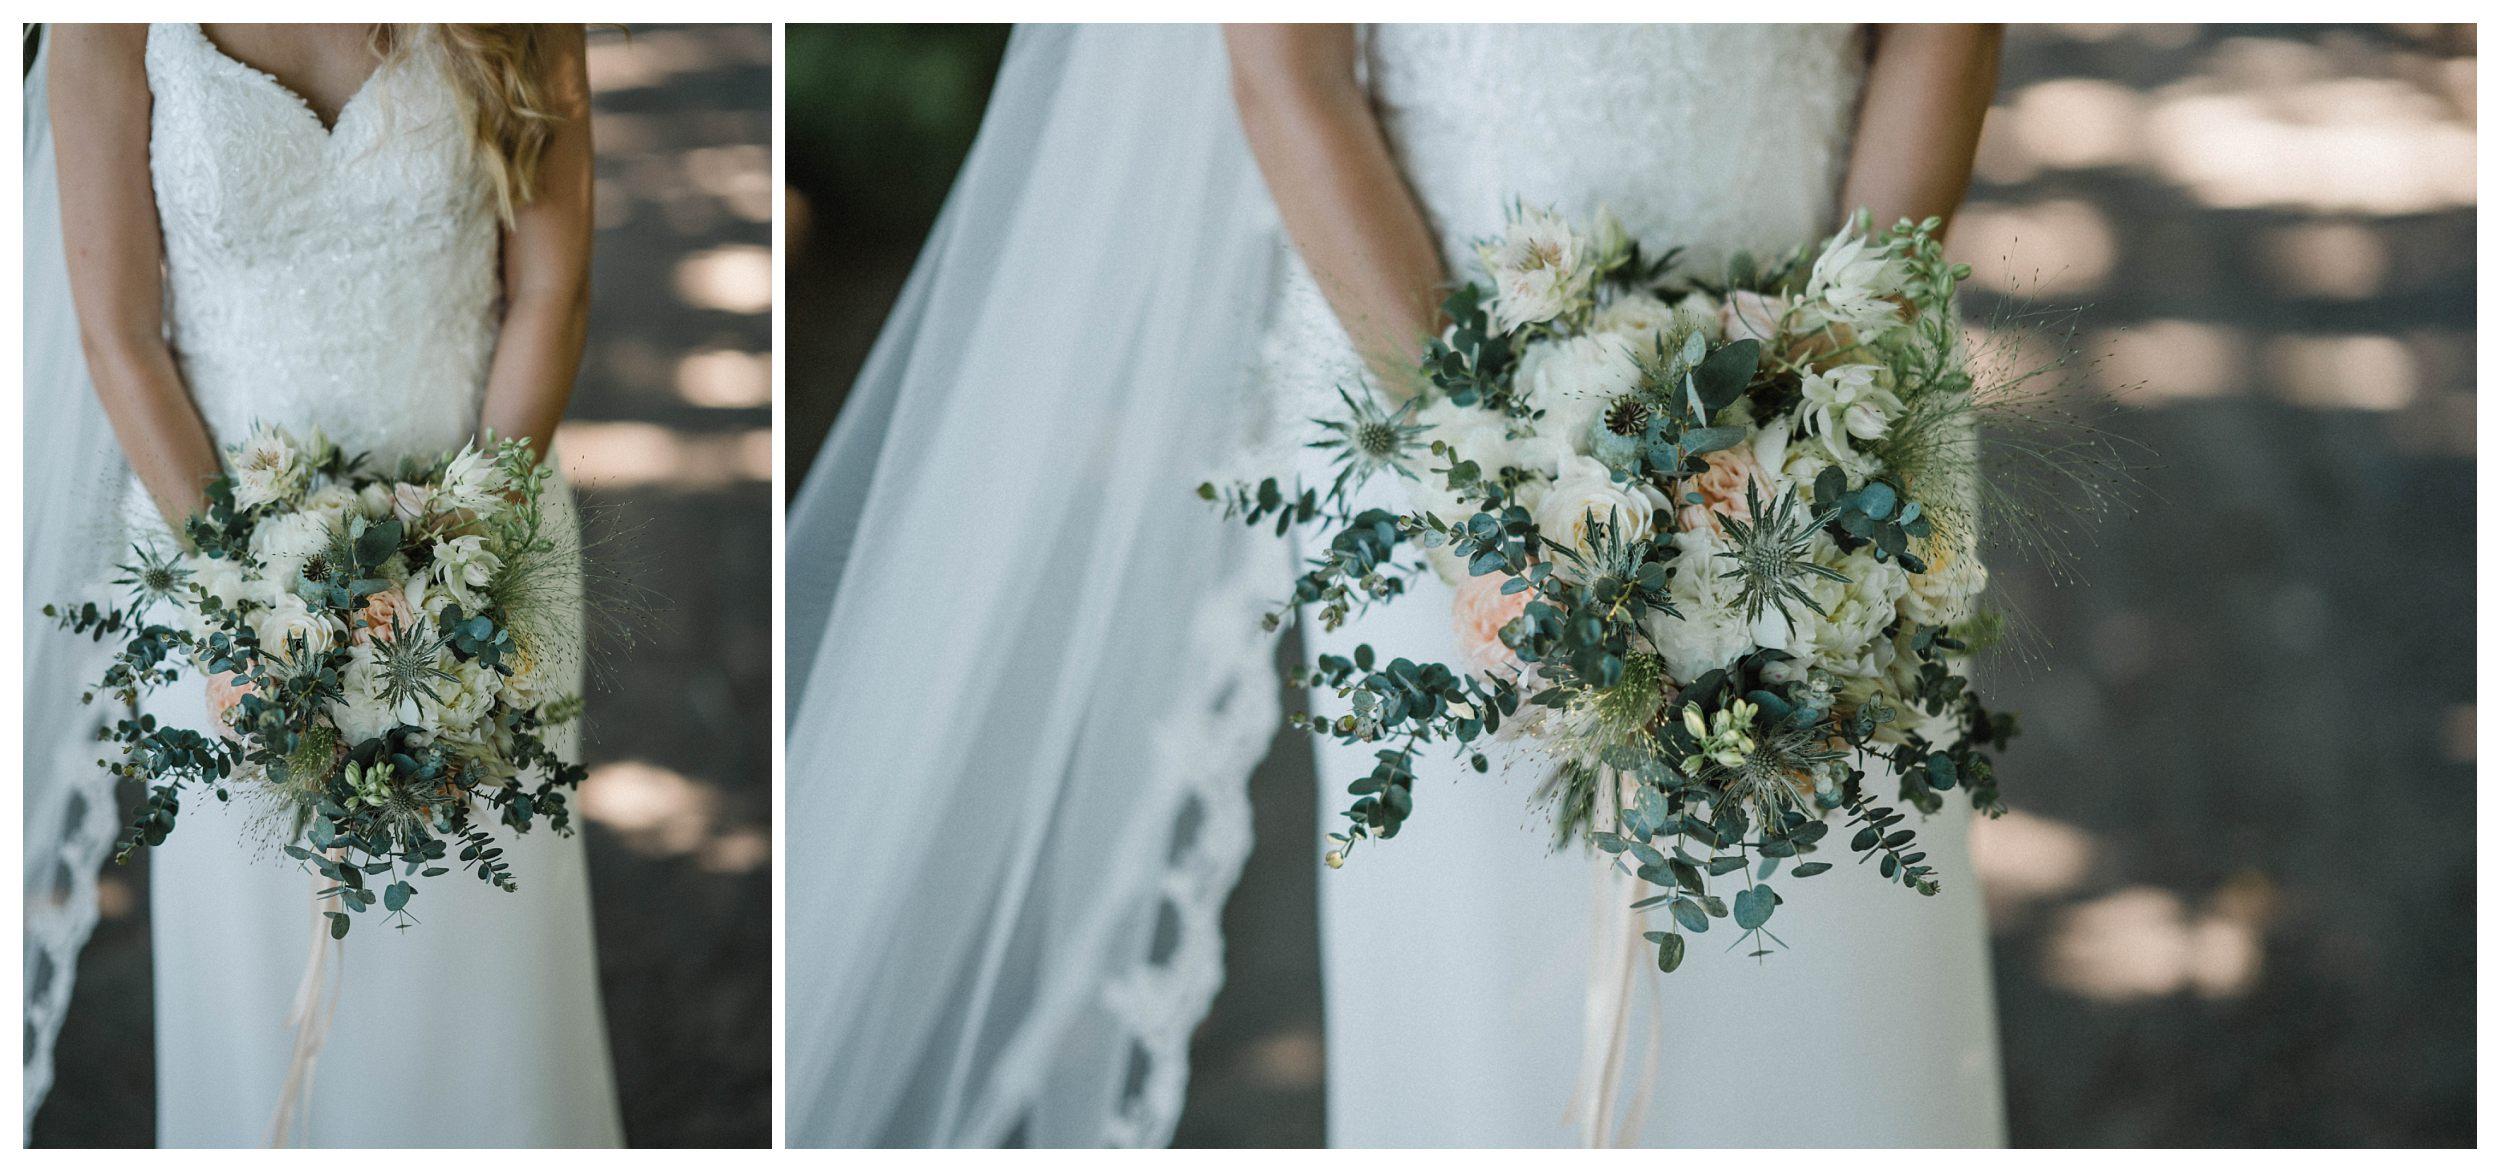 huwelijksfotograaf bruidsfotograaf destinationwedding huwelijksfotografie in ardennen nederland (37).jpg